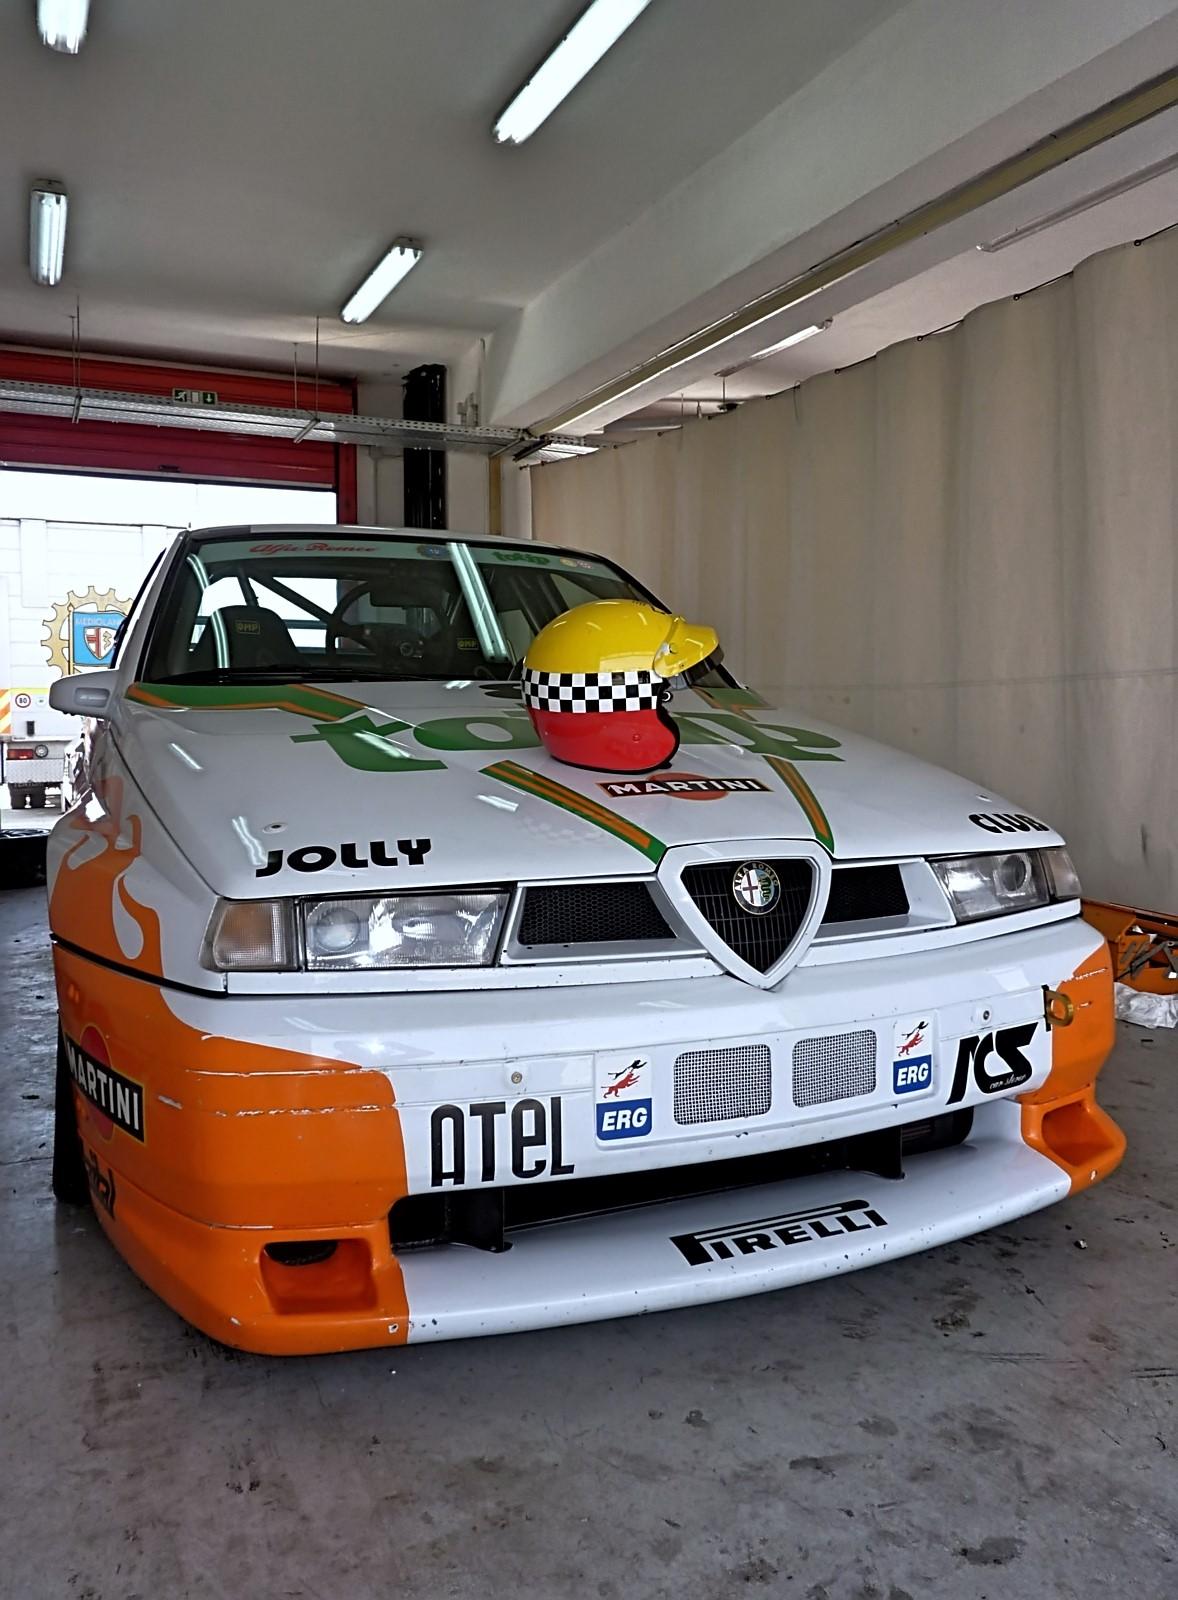 1992 Alfa Romeo 155 GTA S1 (47)